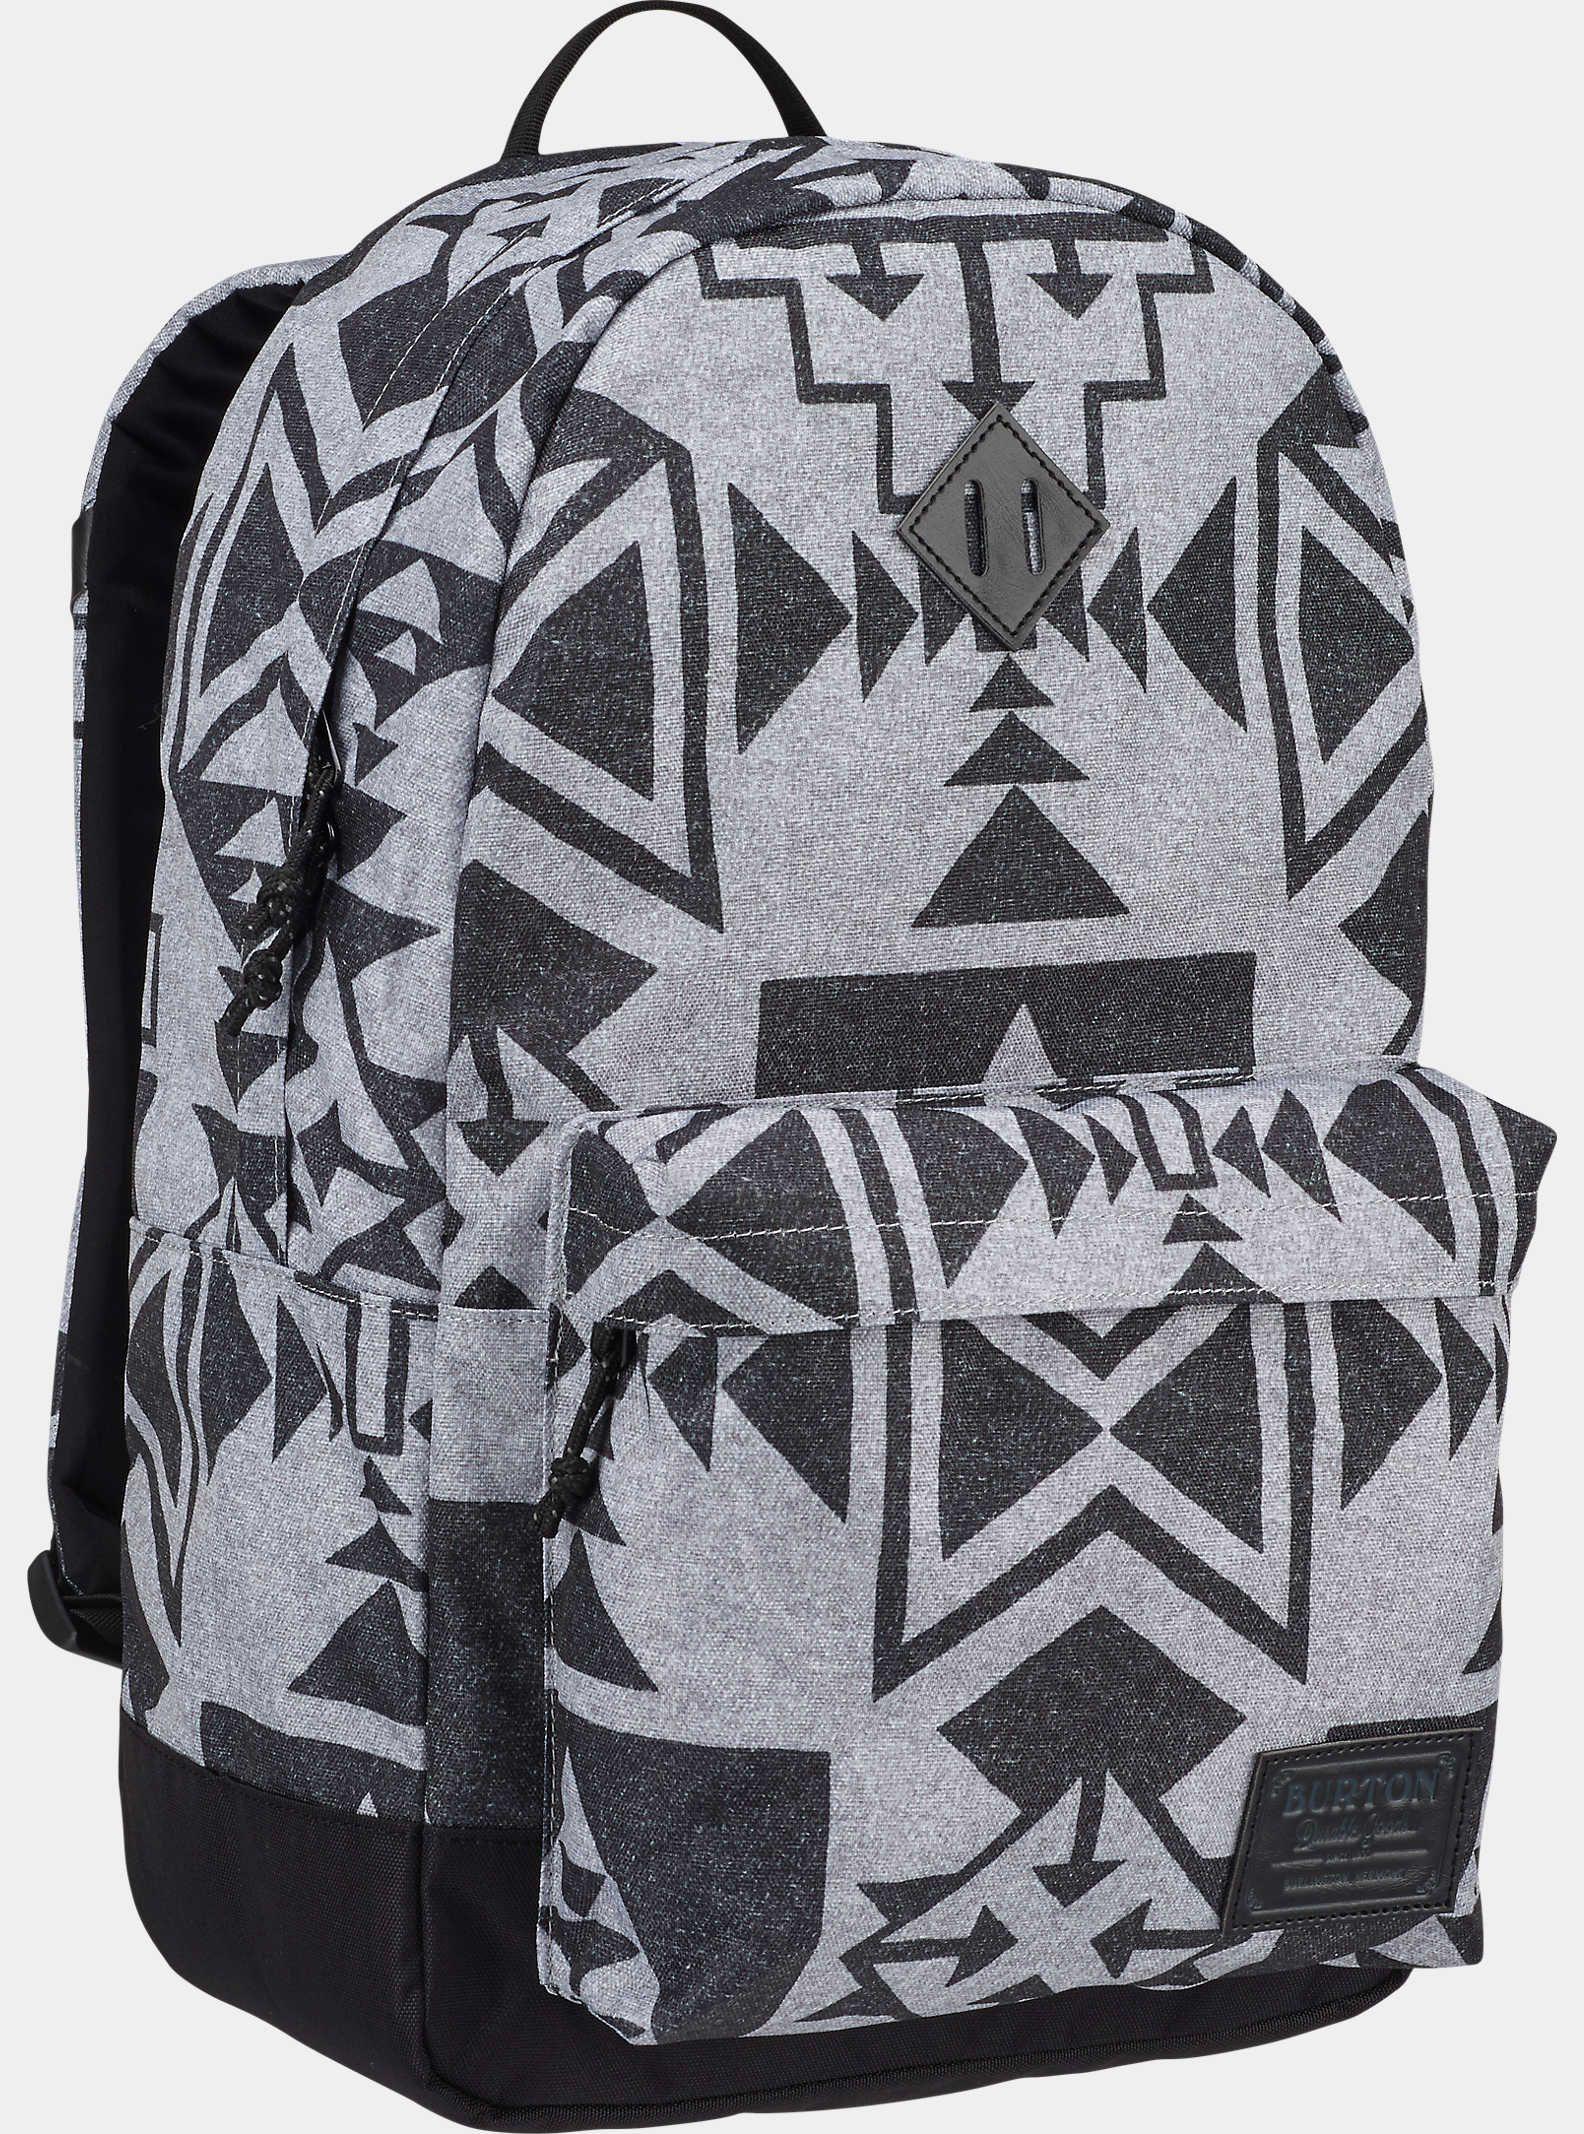 89983a51a4 Burton Women s Kettle Backpack. Burton Women s Kettle Backpack Duffel Bag  ...